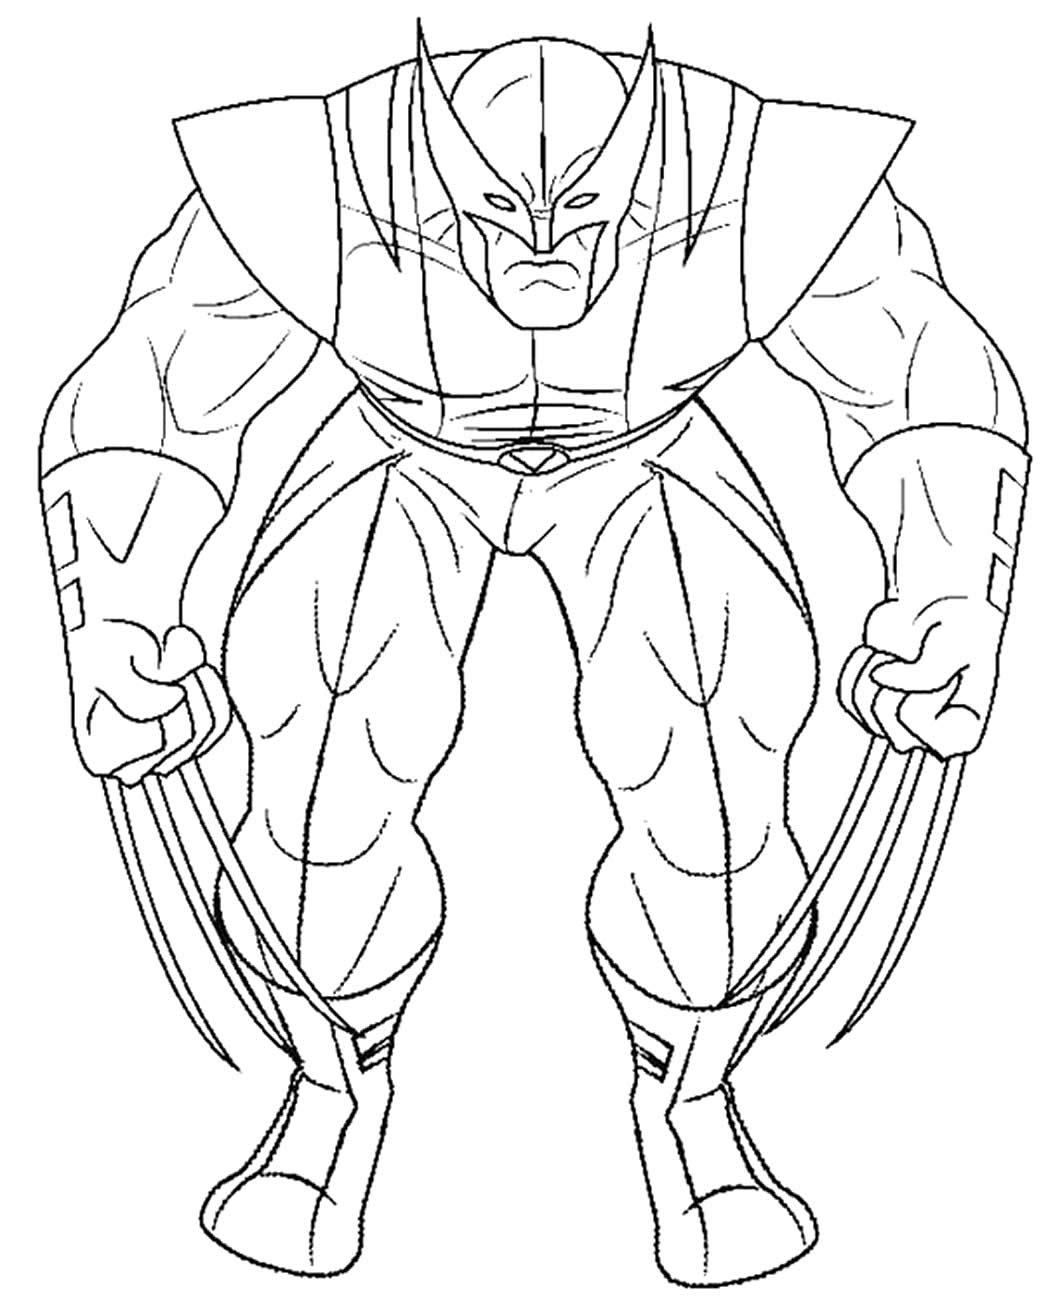 Molde de Wolverine para imprimir e colorir